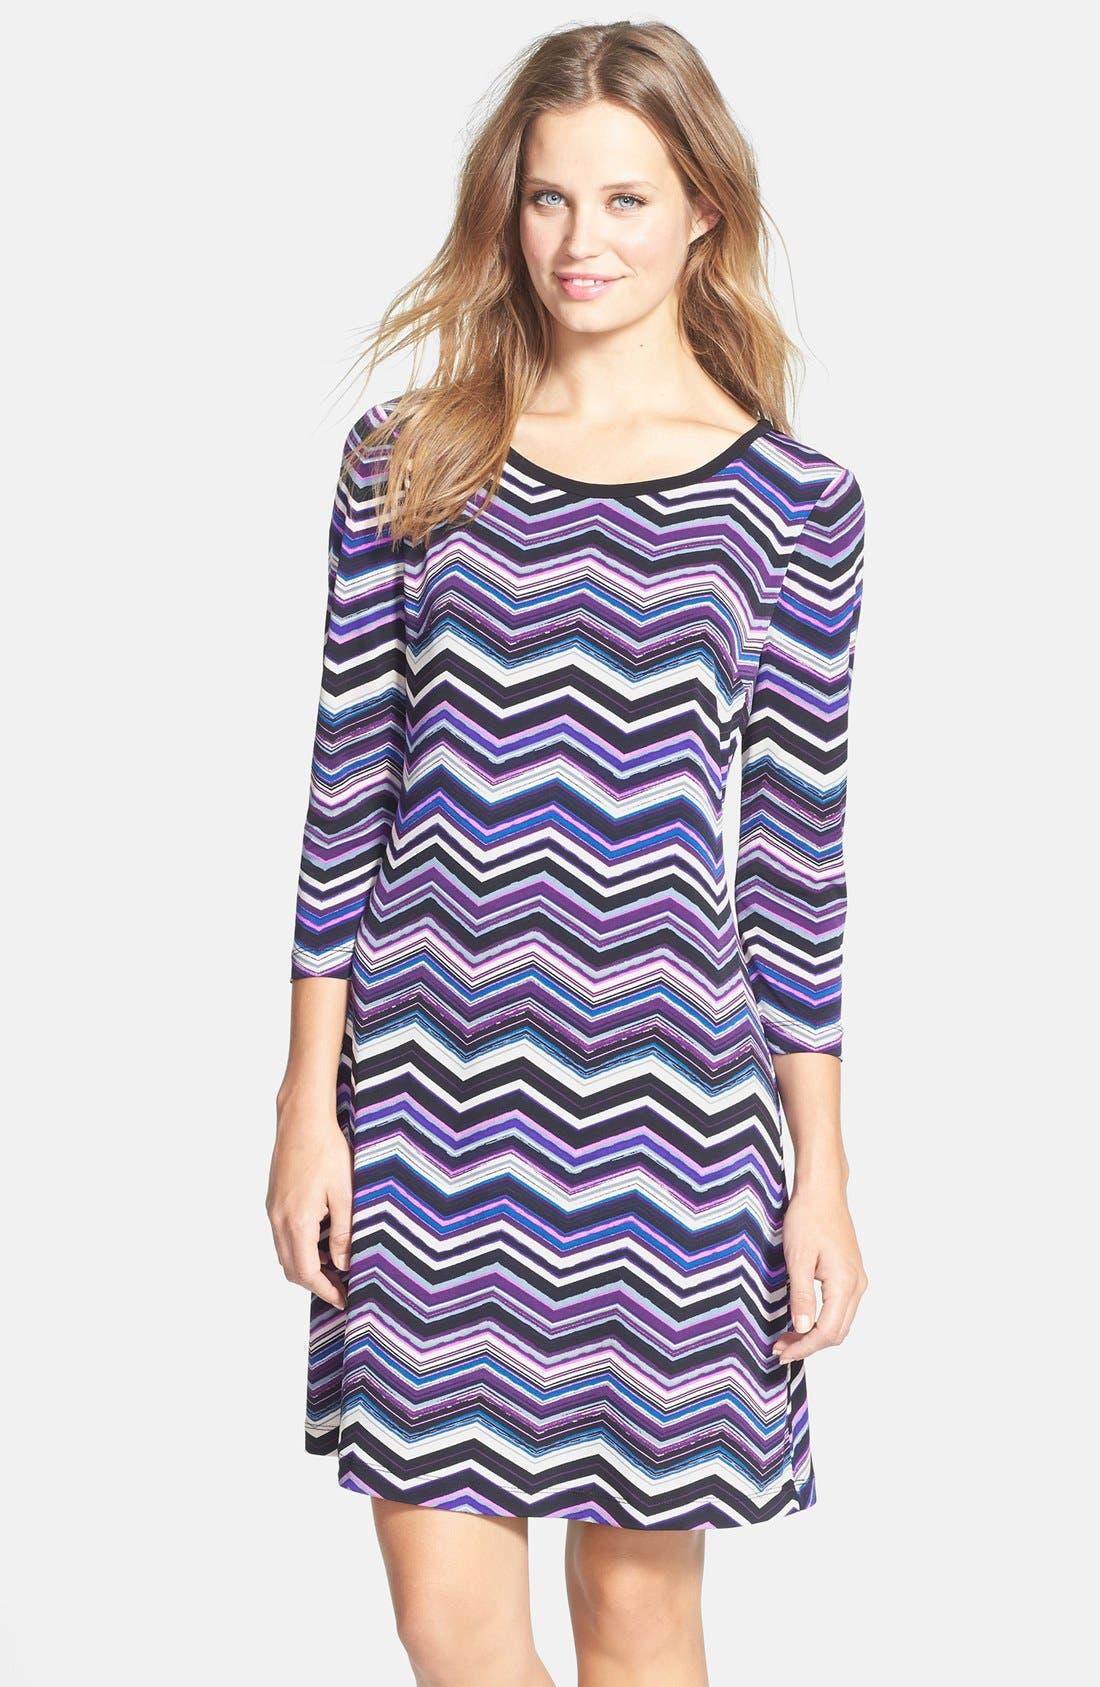 Alternate Image 1 Selected - Eliza J Zigzag Print A-Line Dress (Petite)